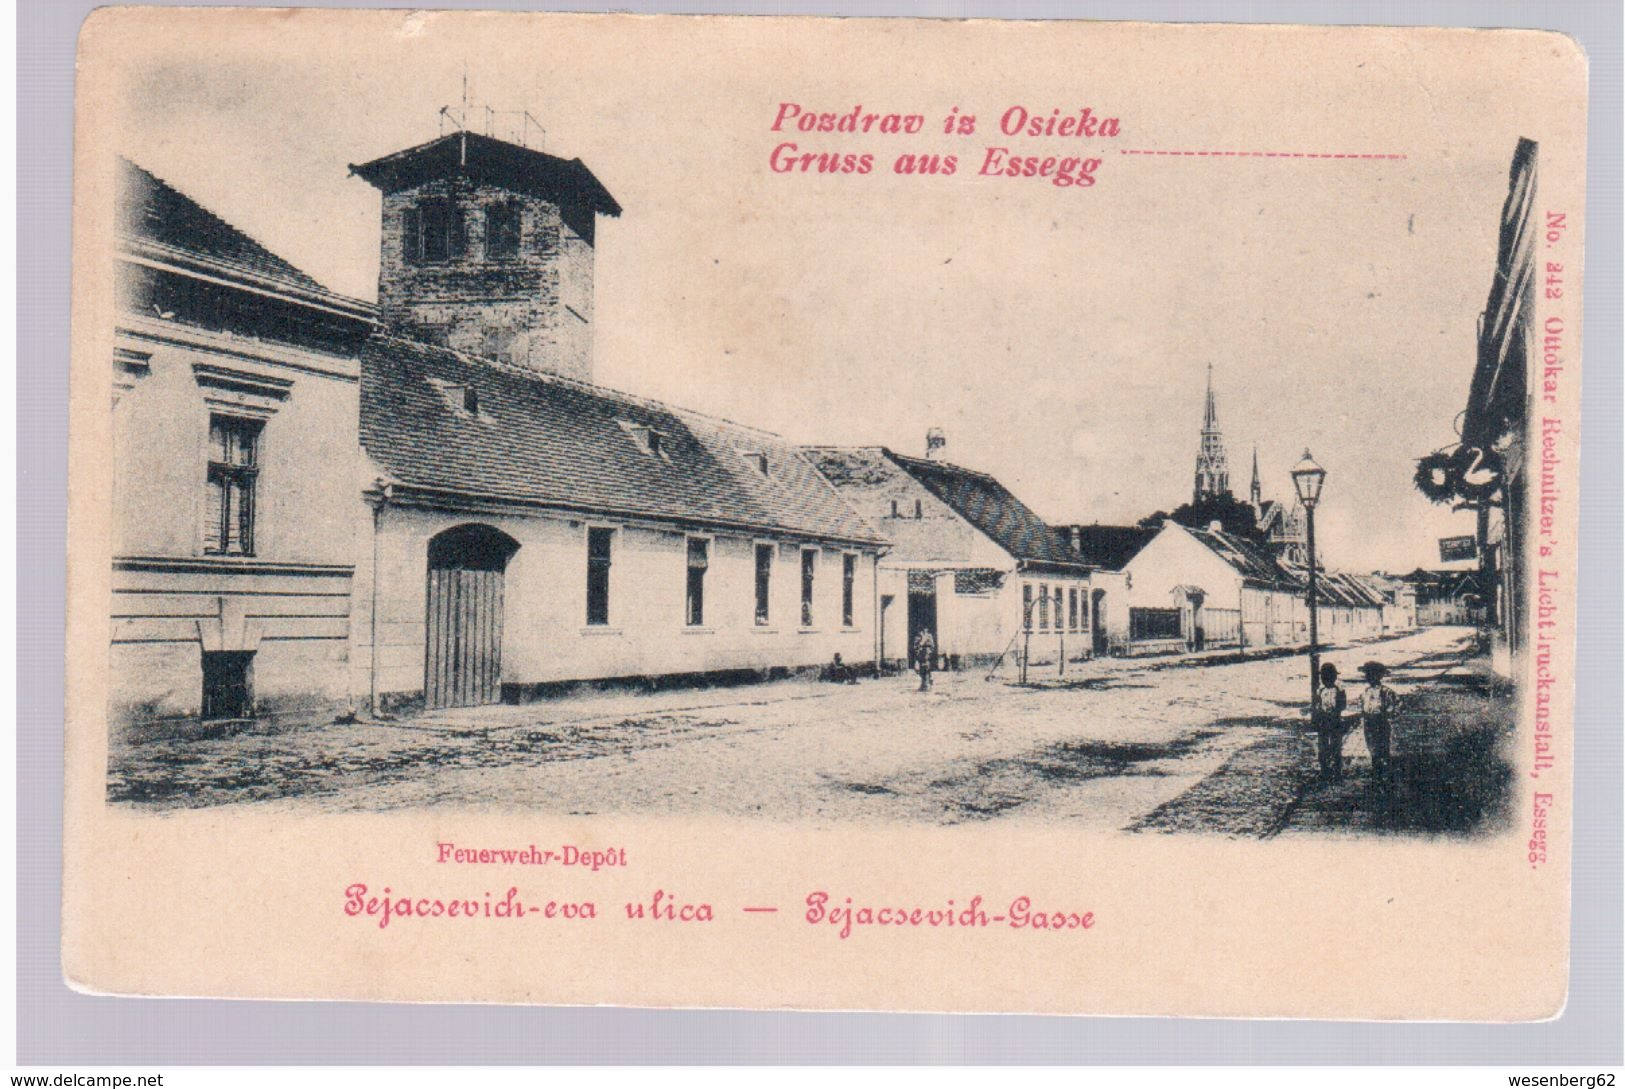 CROATIA Osijek Pozdrav Iz Osieka Gruss Aus Essegg Feuerwehr- Depot Ca 1900 OLD POSTCARD 2 Scans - Croatia